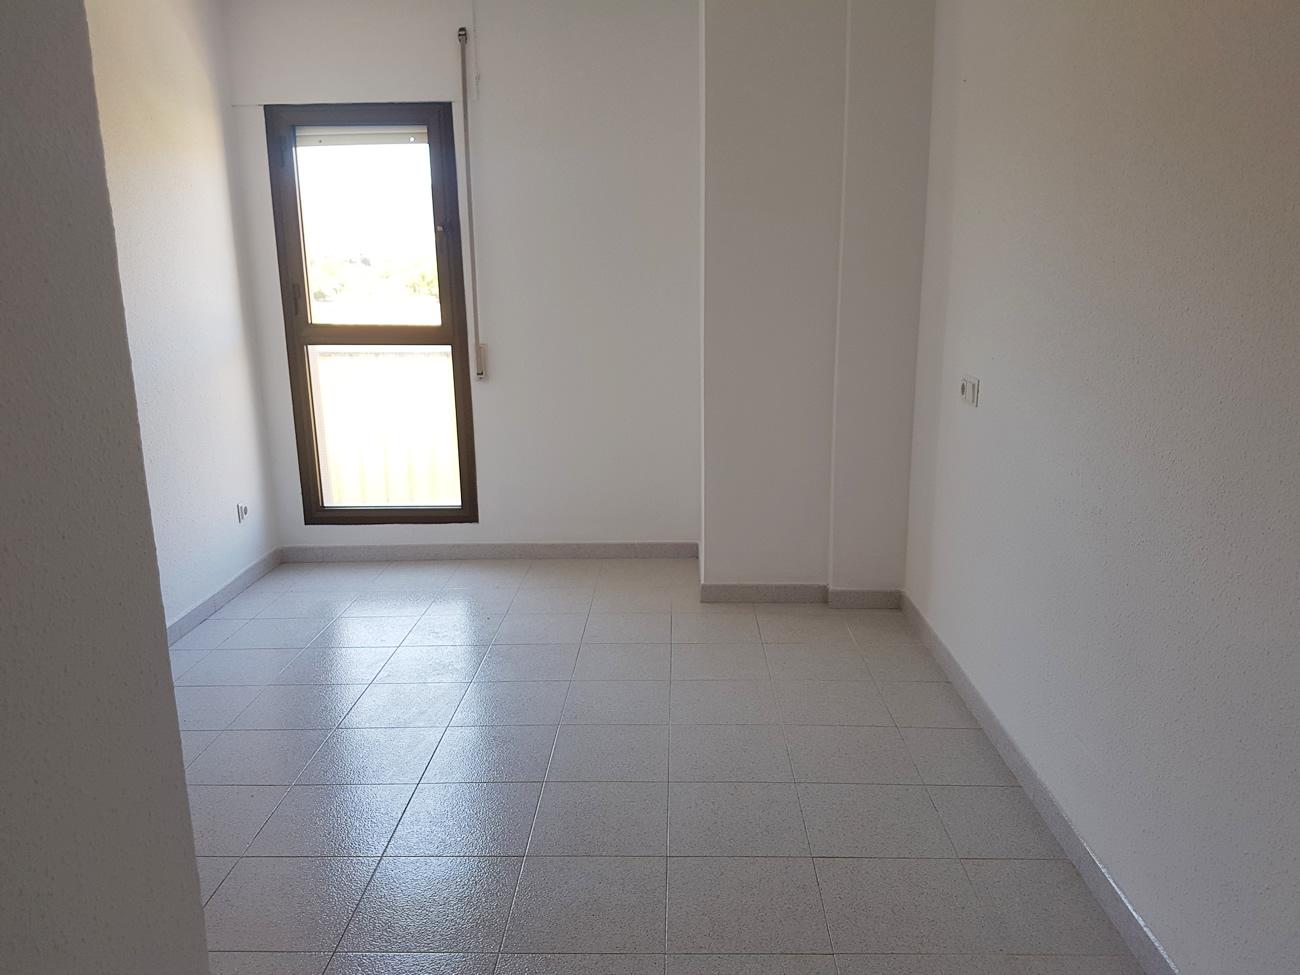 habitacion-doble1-antes